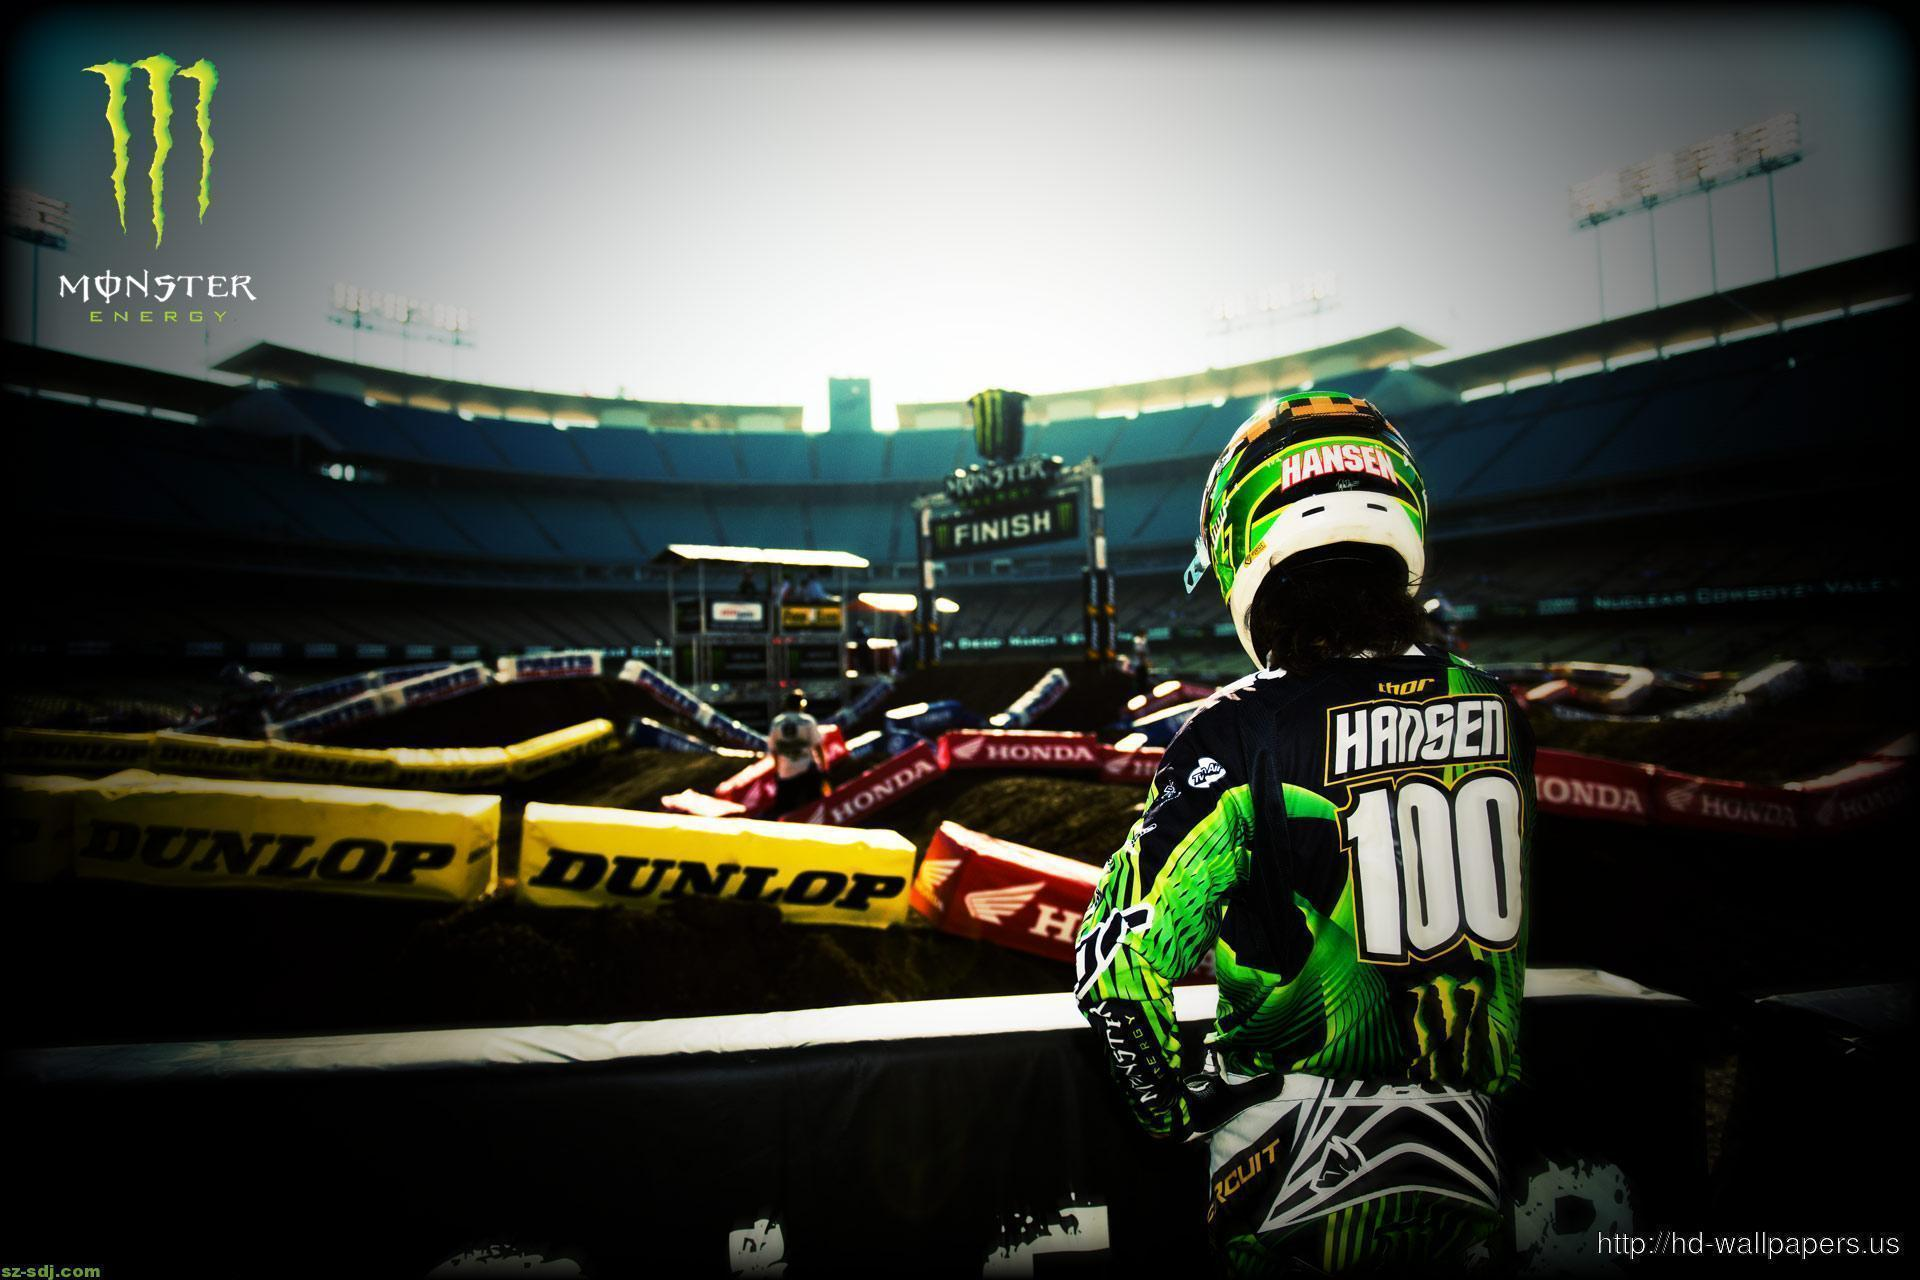 Hansen Motocross Monster Energy Wallpaper Hd – Free Download HD ...